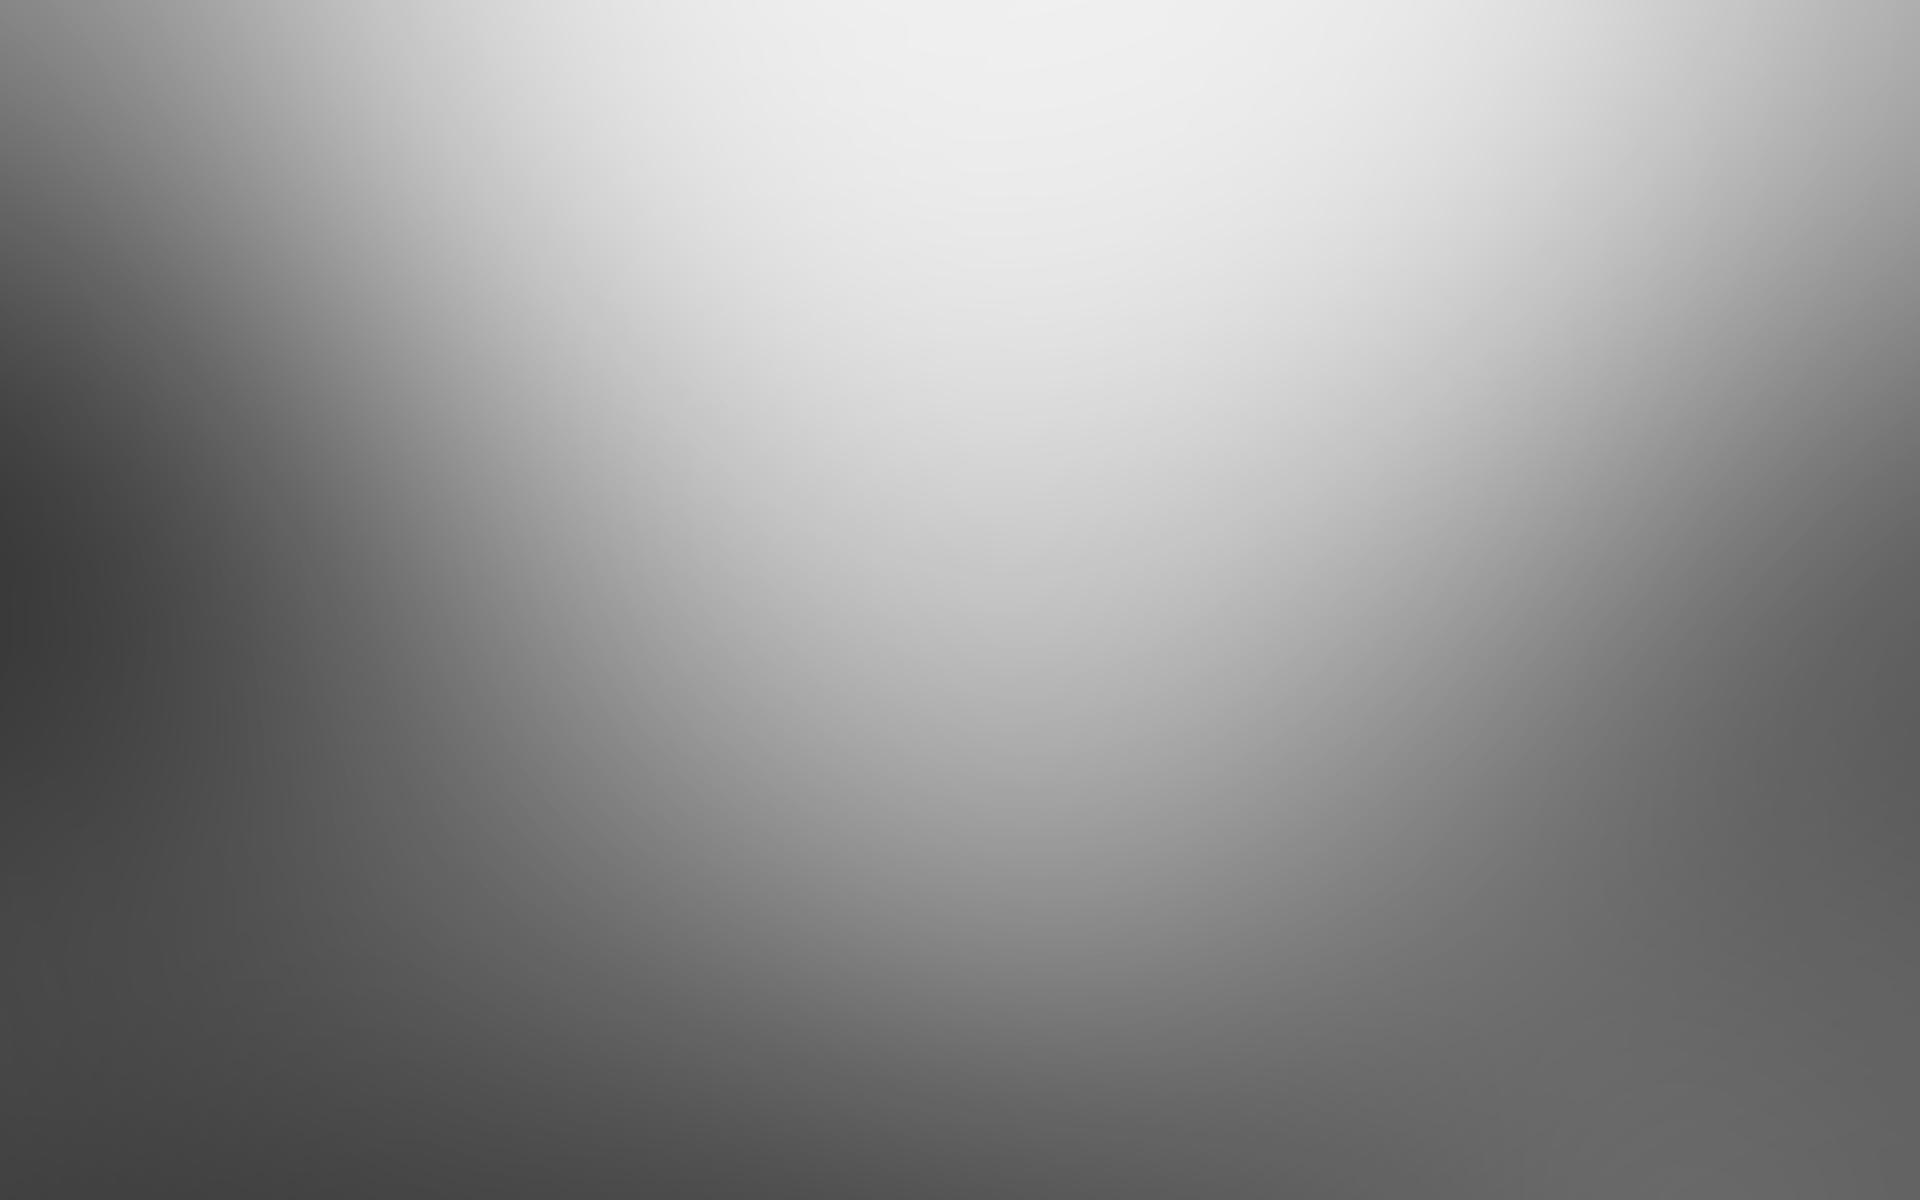 Grey Wallpaper Hd 75 Images